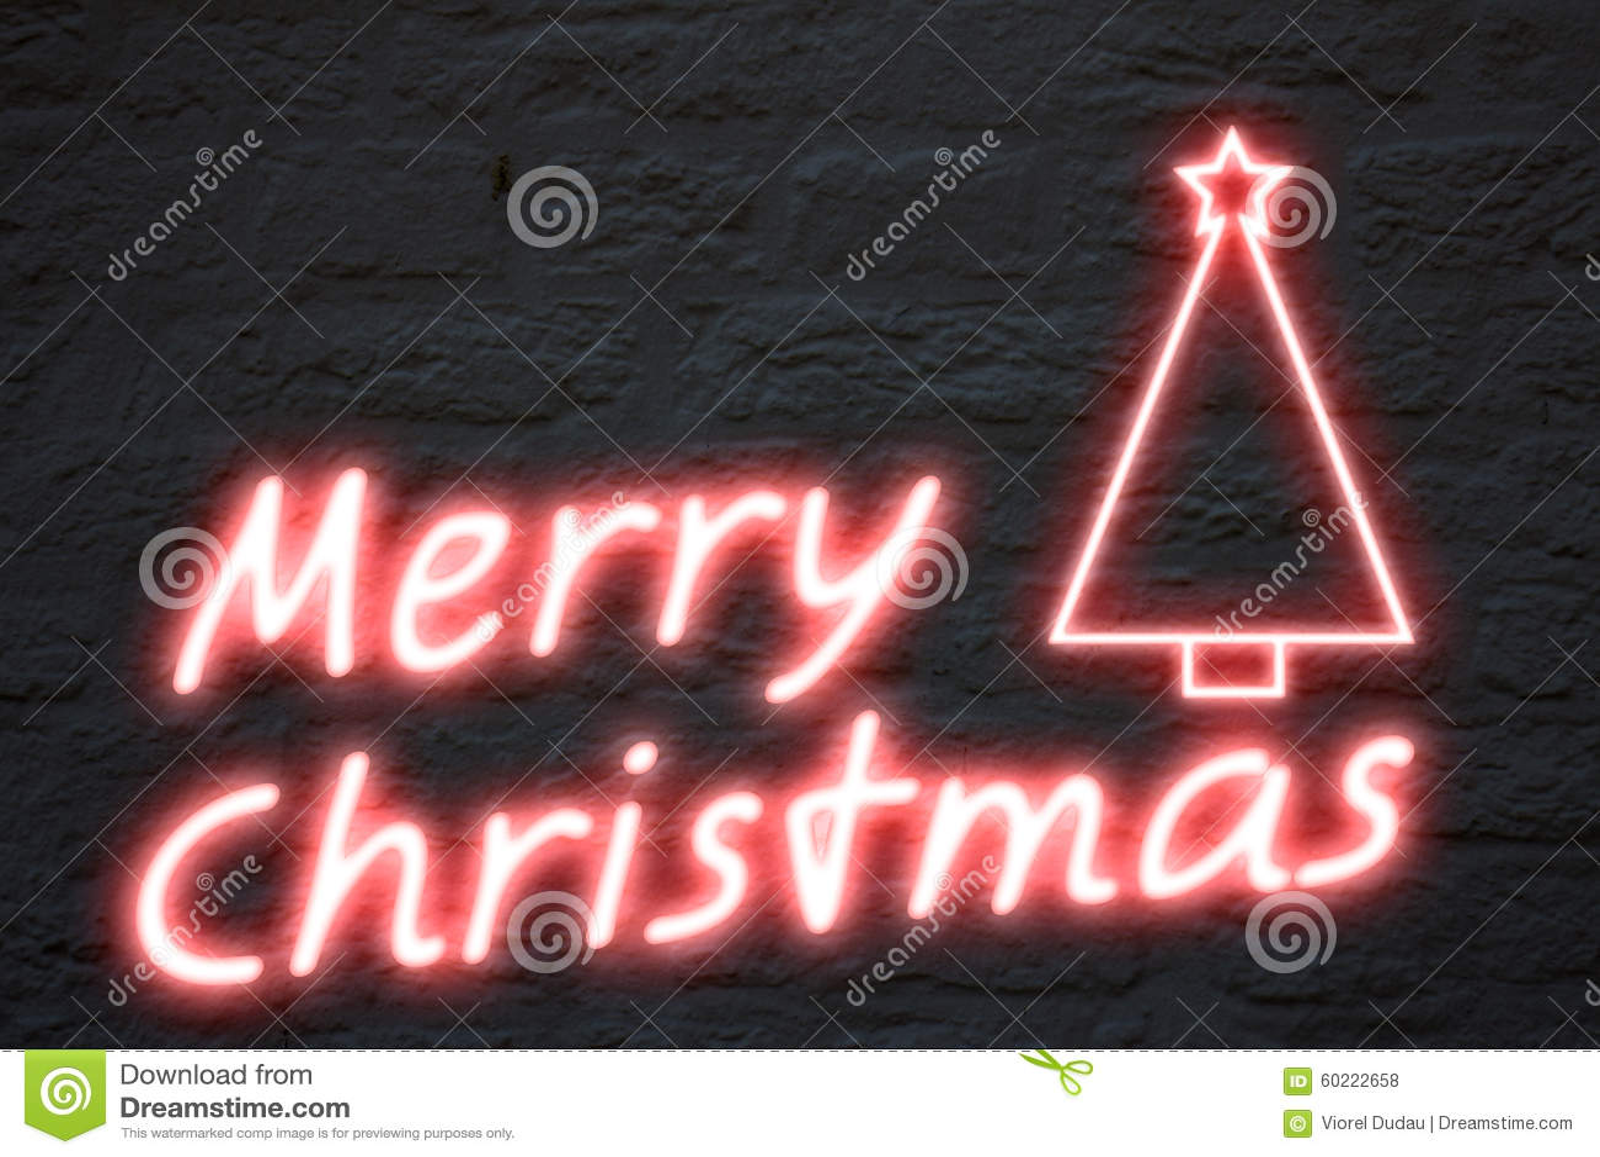 merry christmas neon lights stock illustration